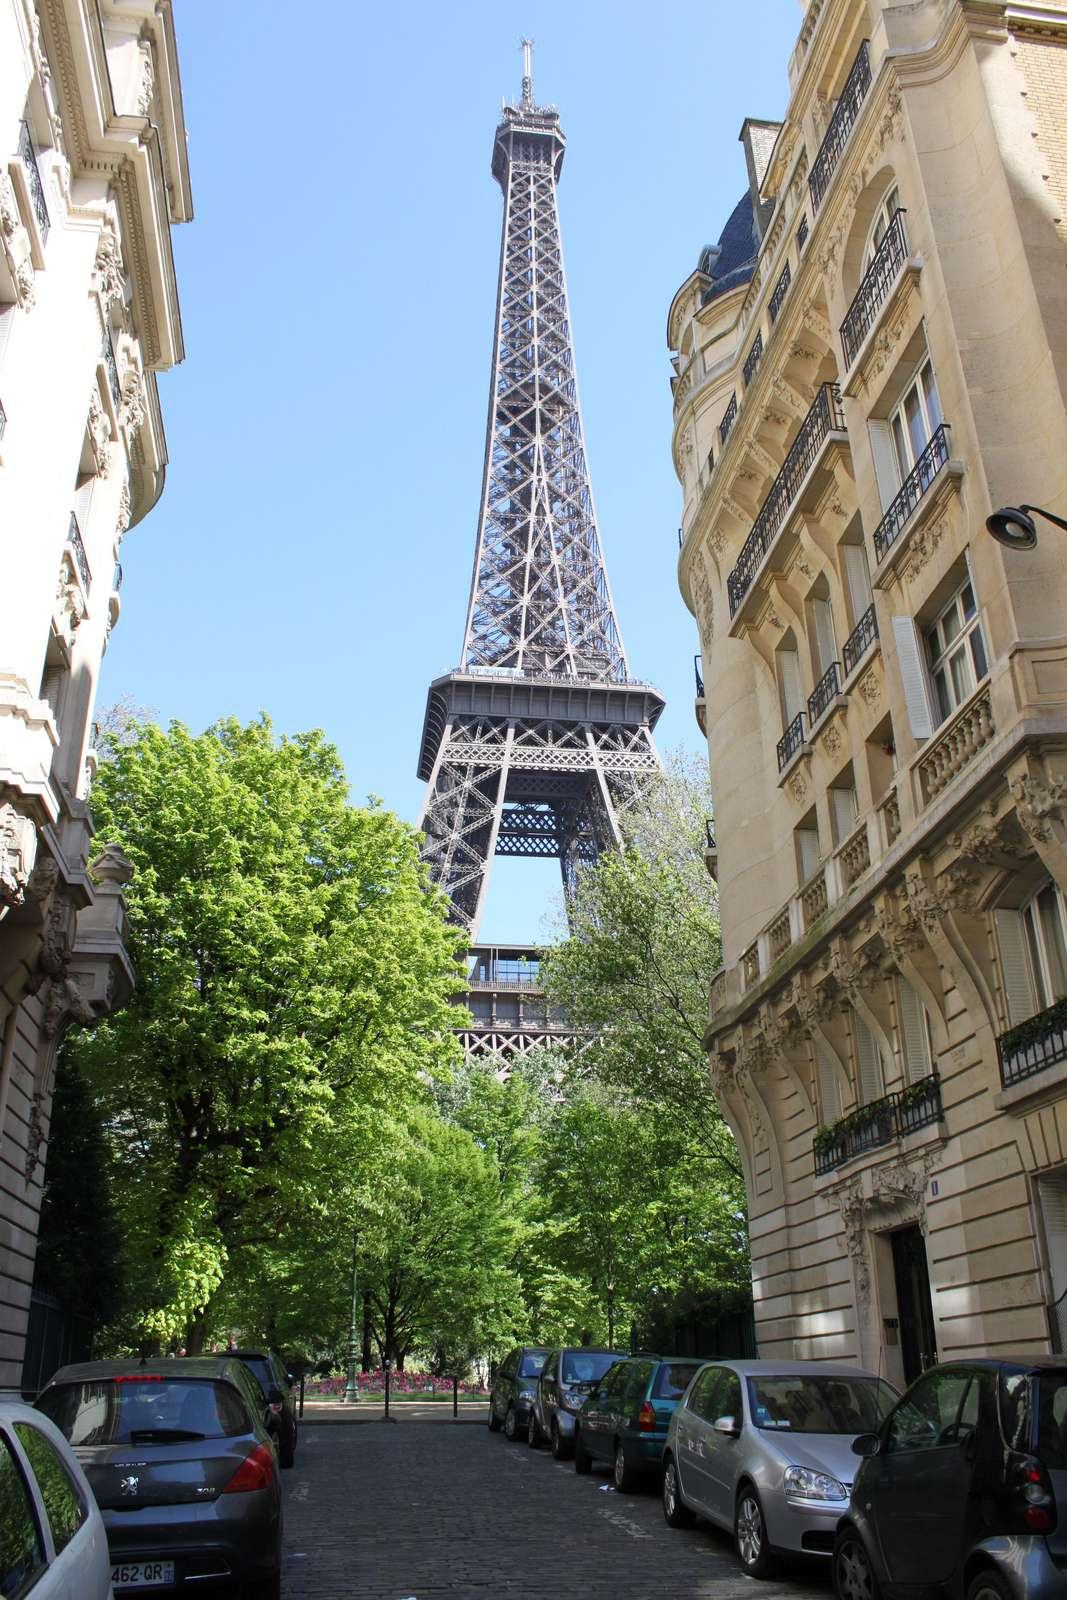 Panache Rental Luxury Paris Apartment Rentals Eiffel Tower View